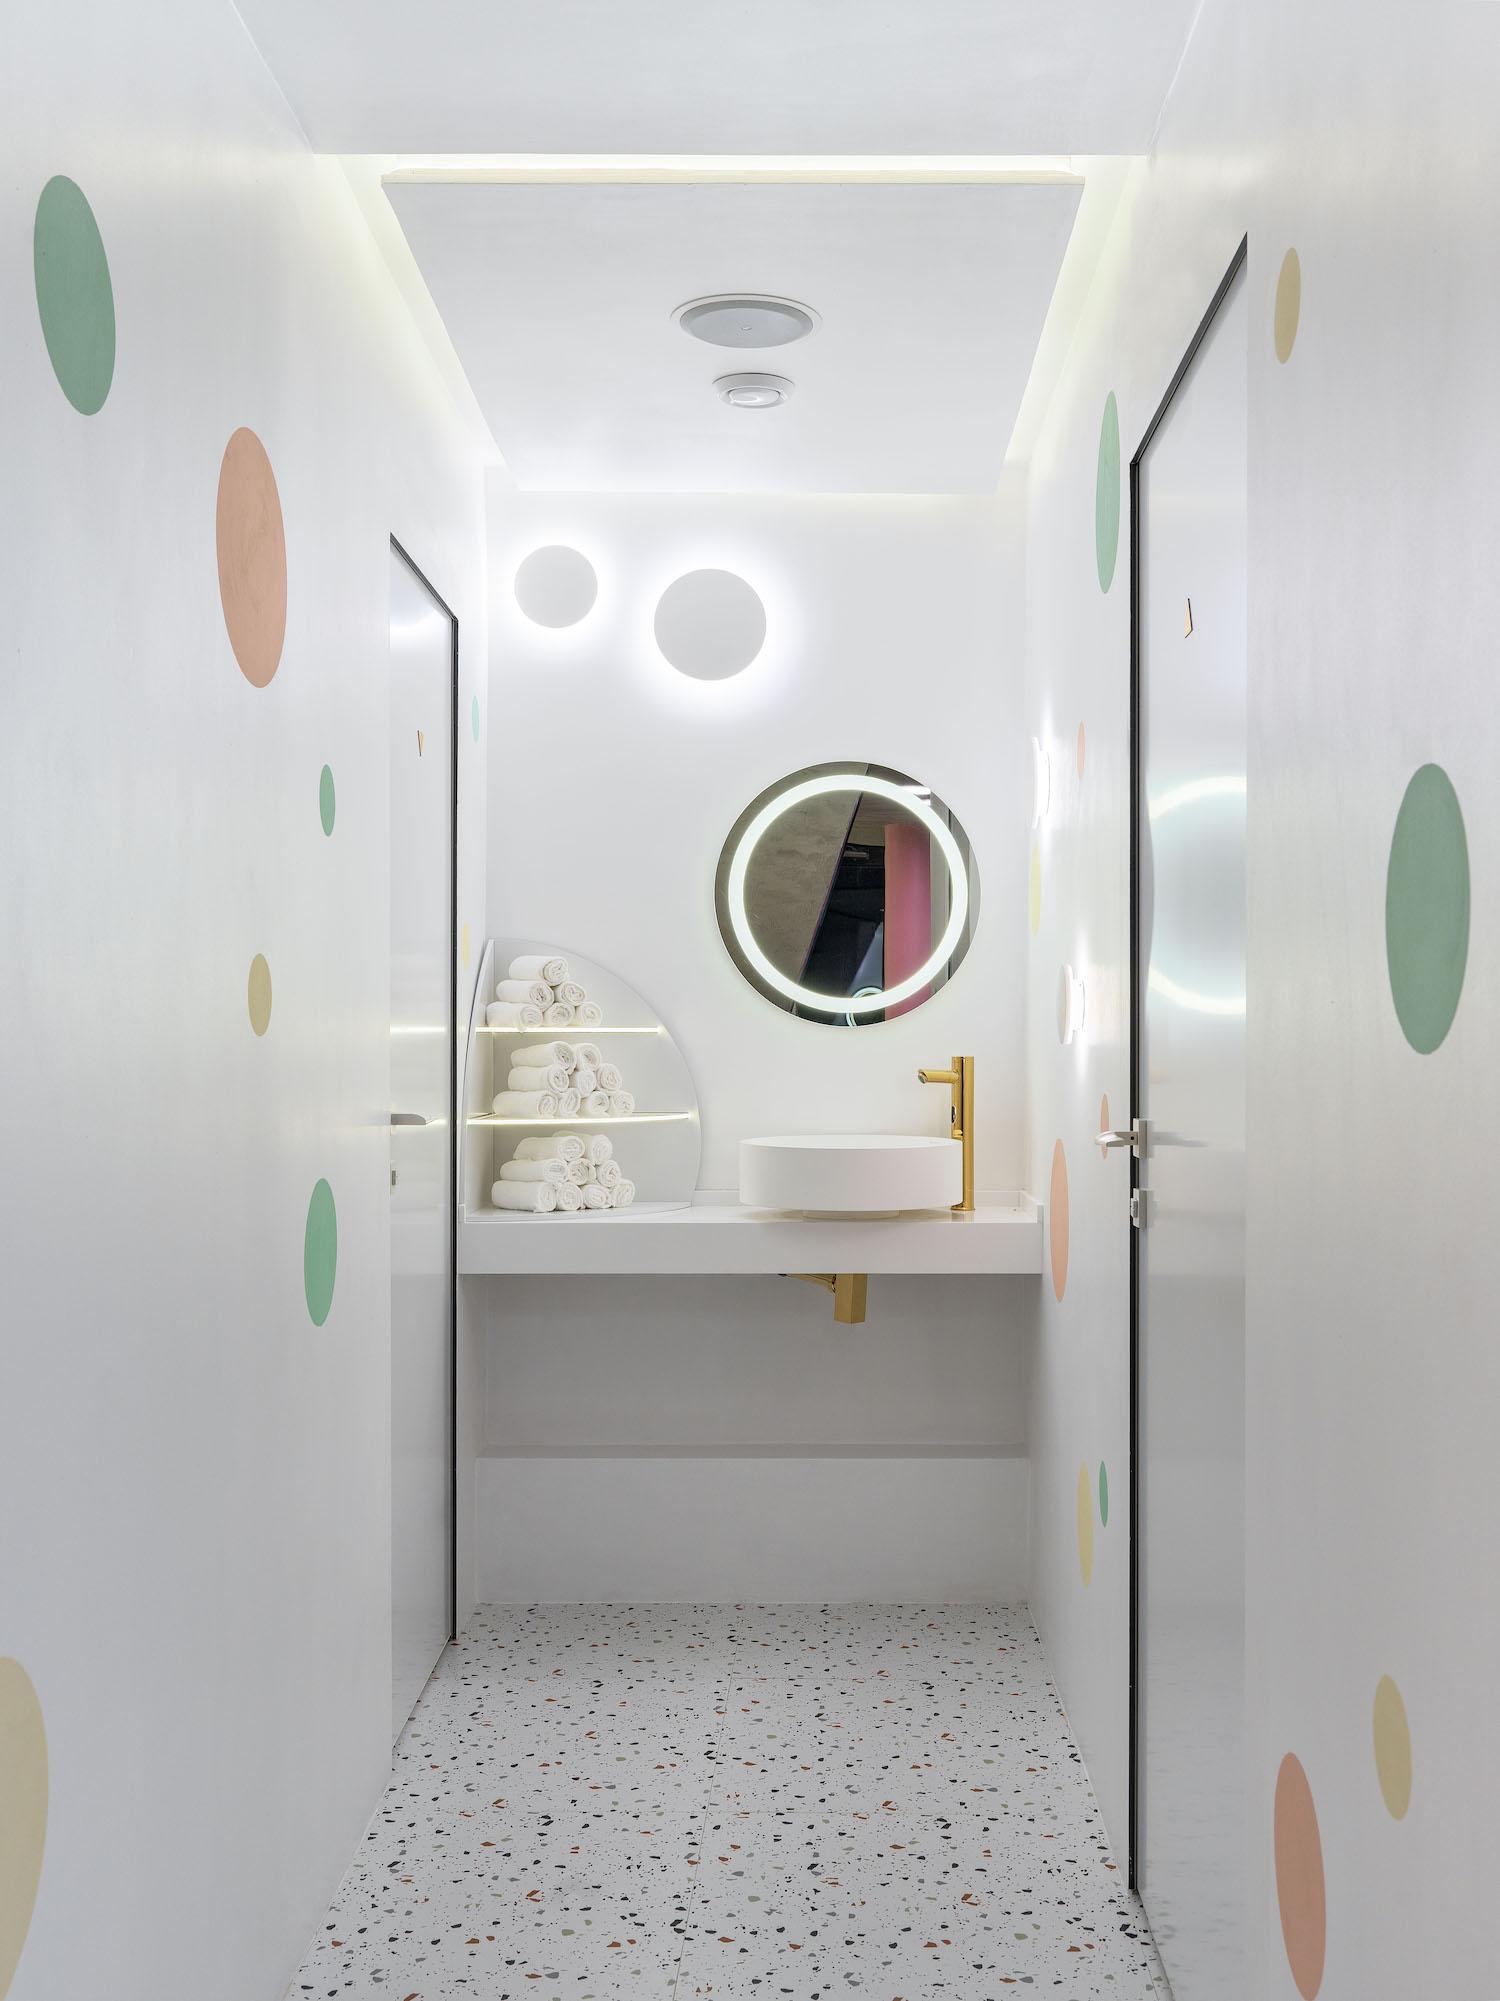 white bathroom with ceramic washing basins